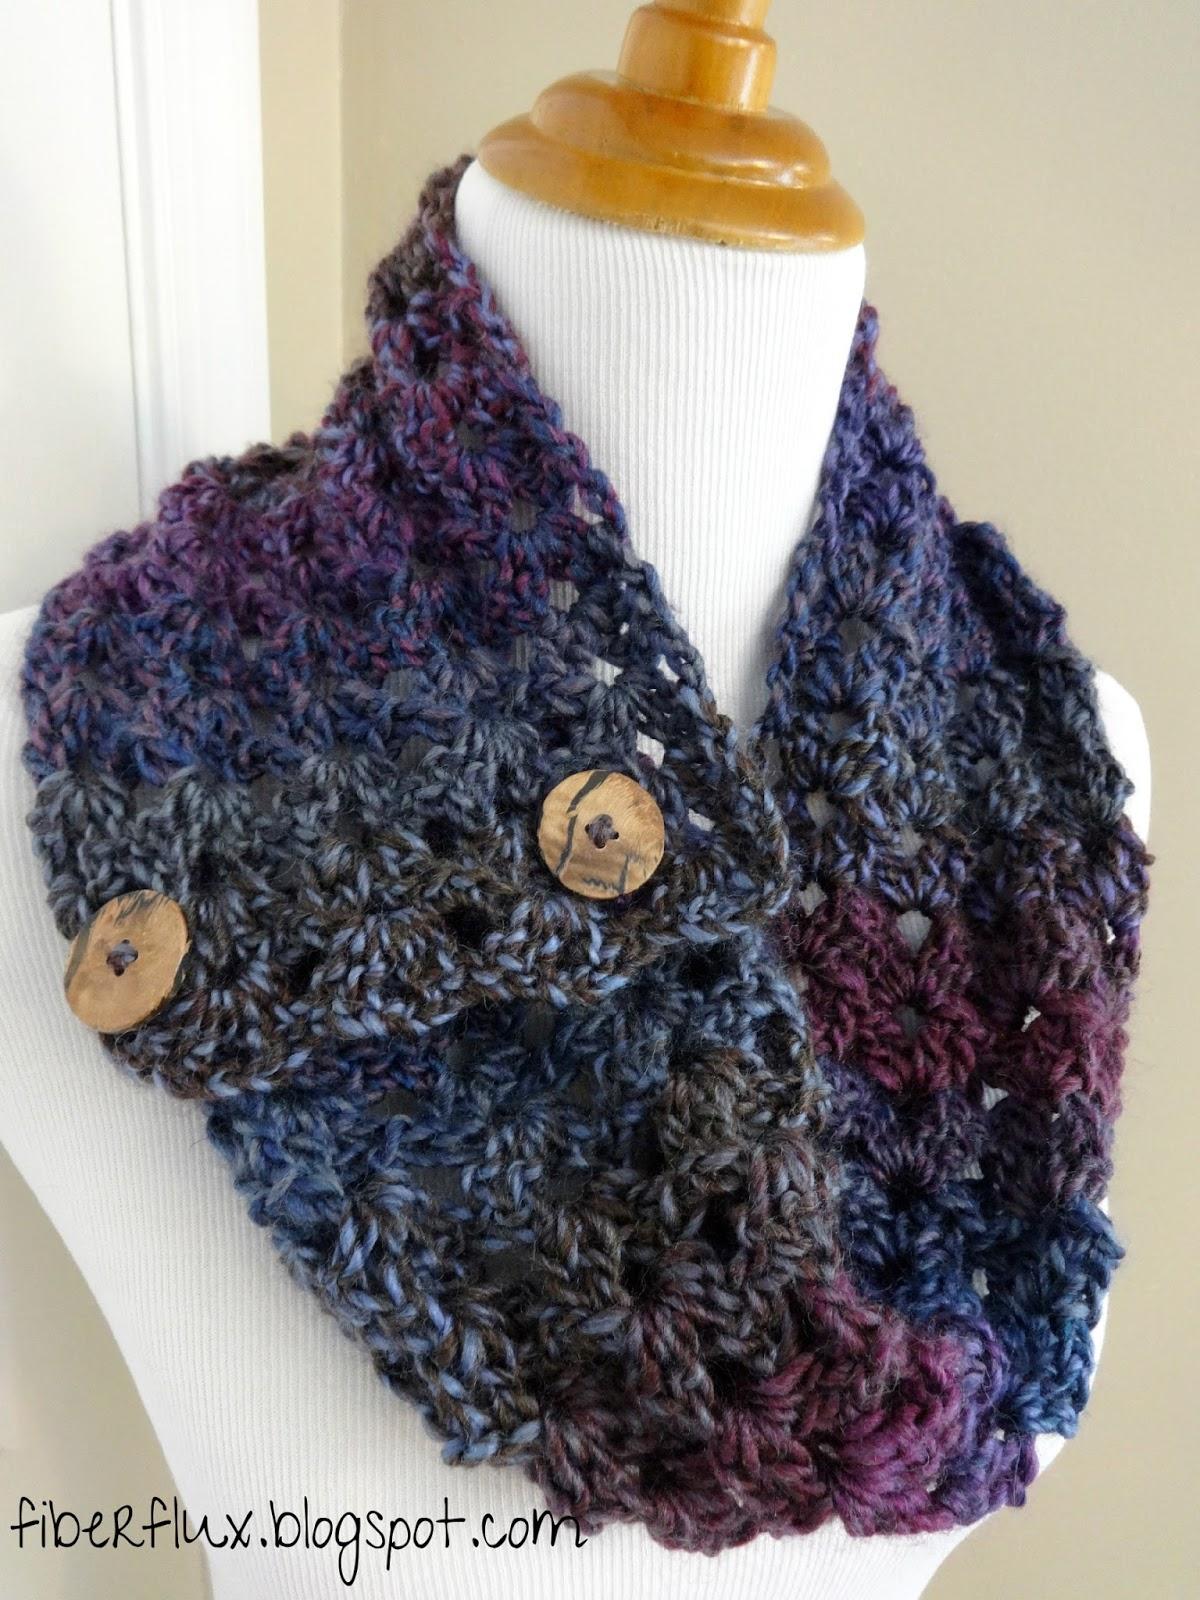 Fiber Flux: Chunky Cowls! 25 Free Crochet Patterns...